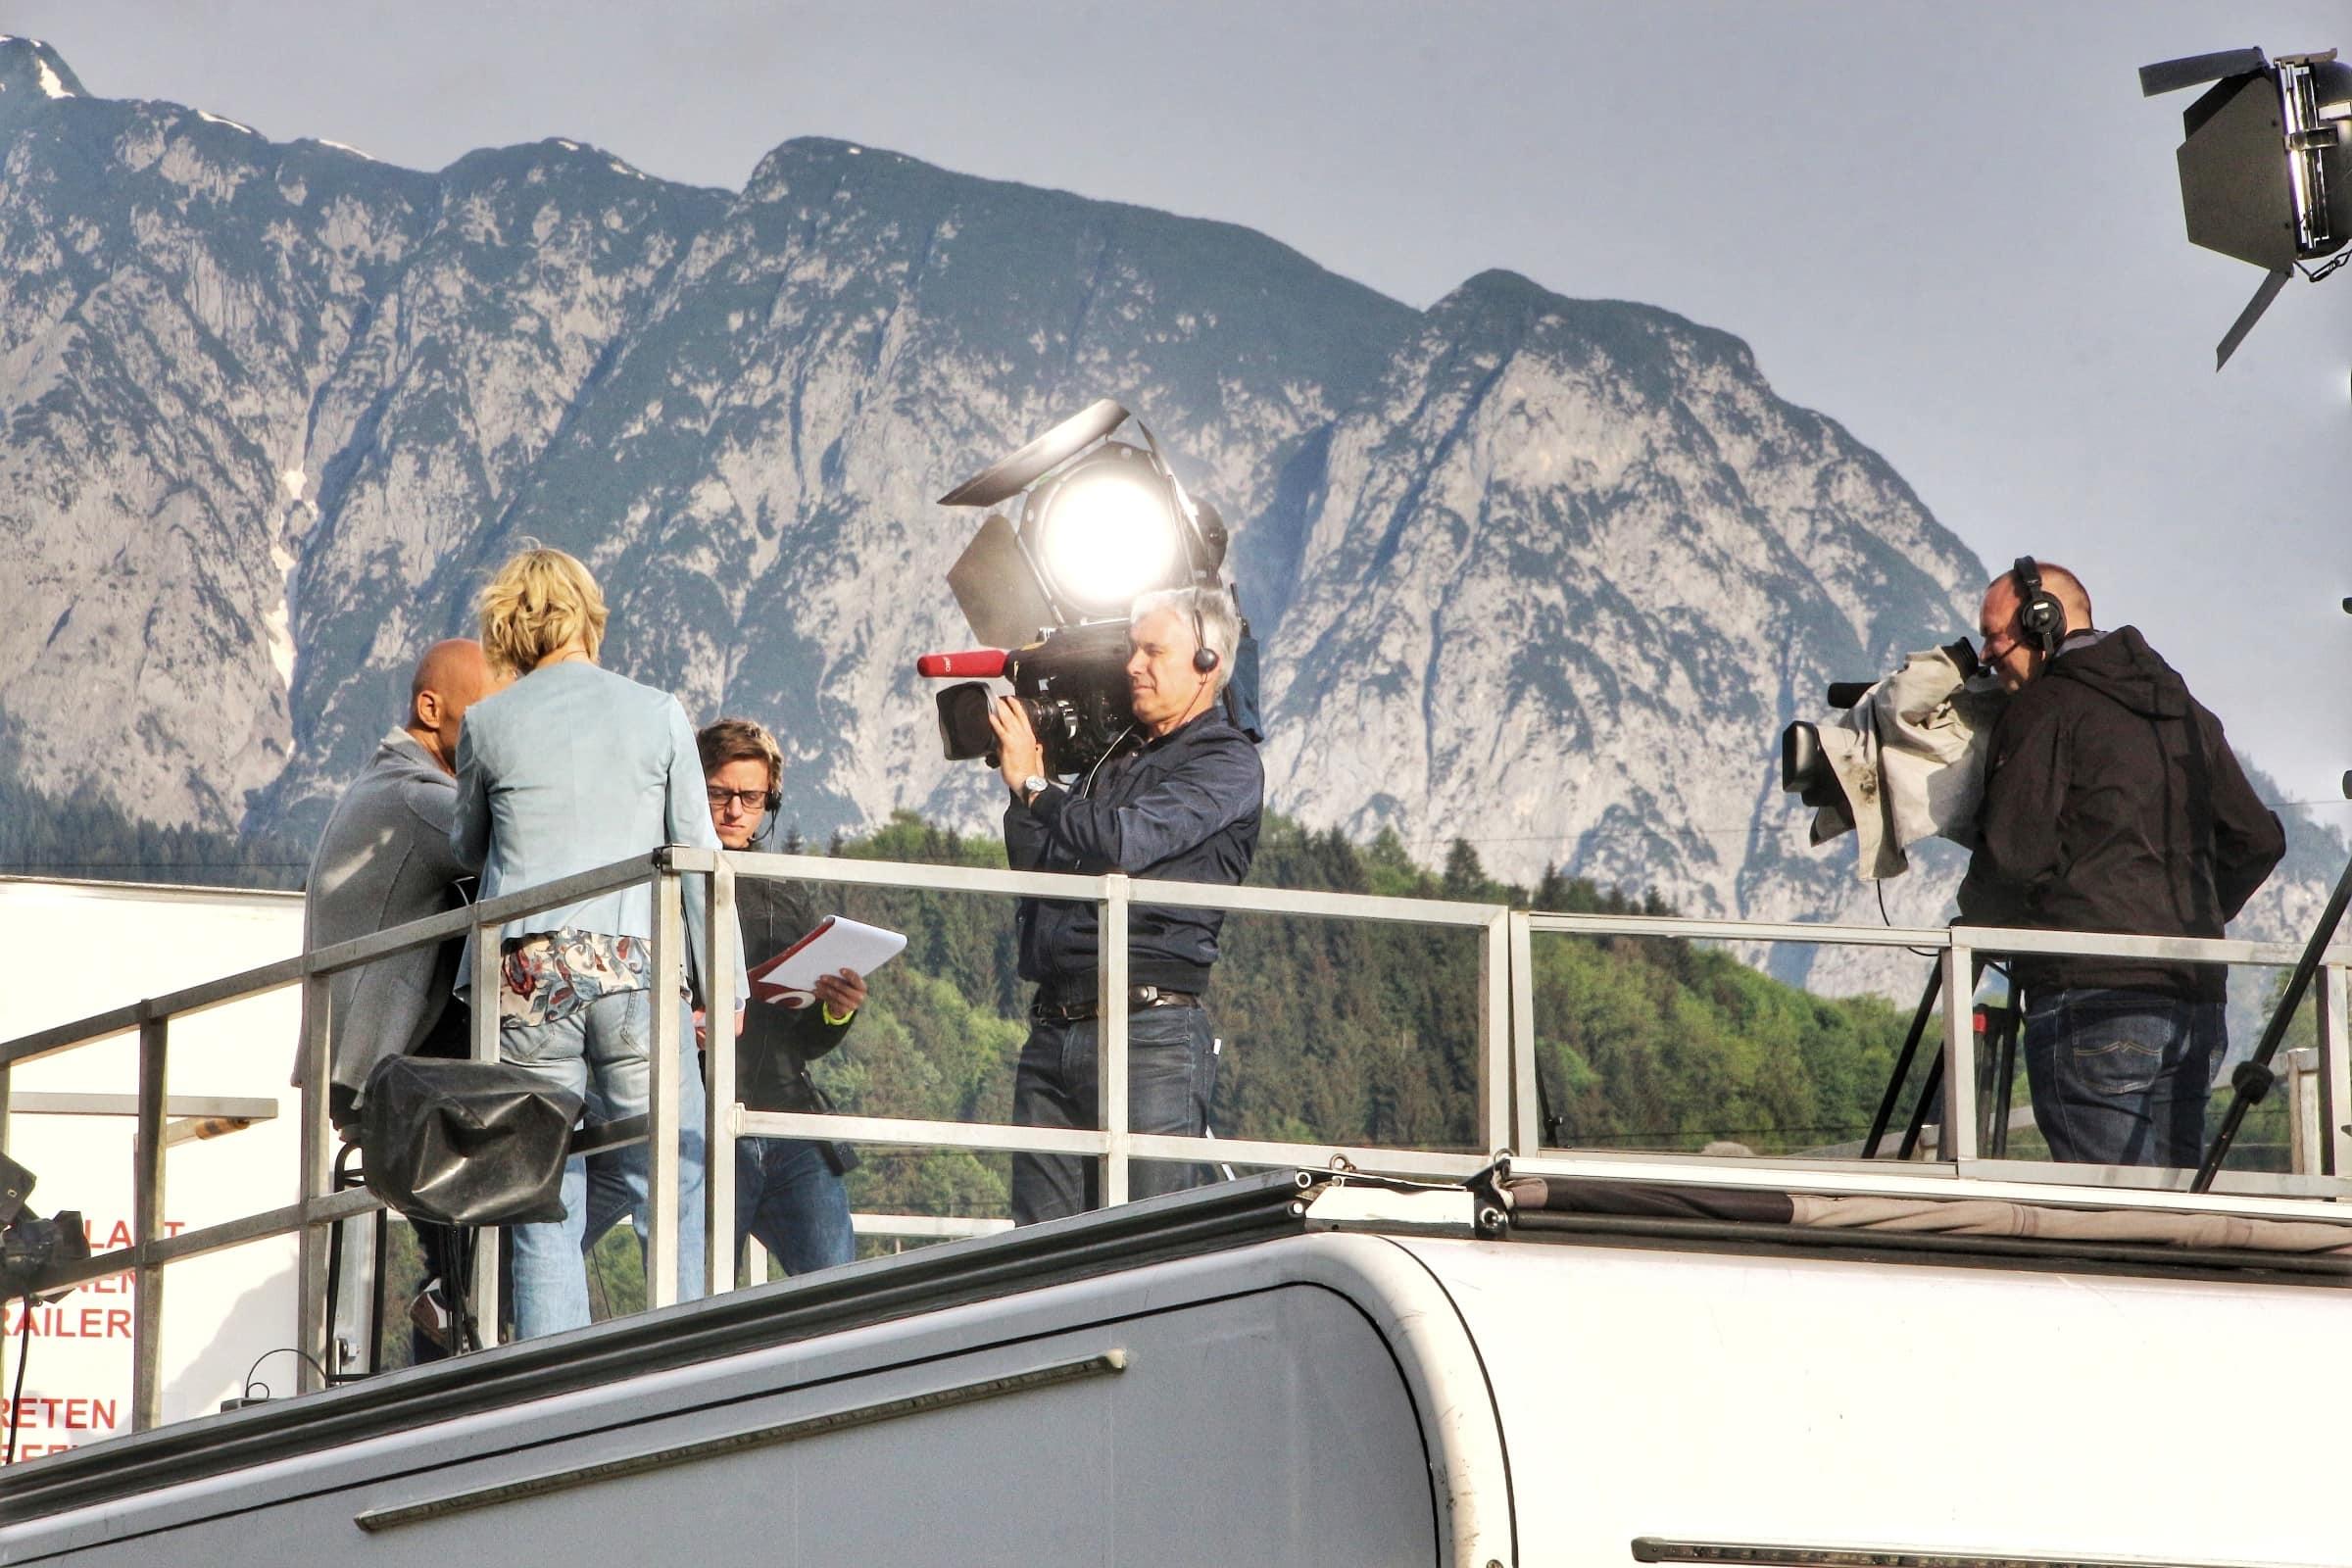 andreas felder kameramann orf unterwegs in österreich 20 02.05.2018 08 16 35 - ORF Unterwegs in Österreich - Tirol